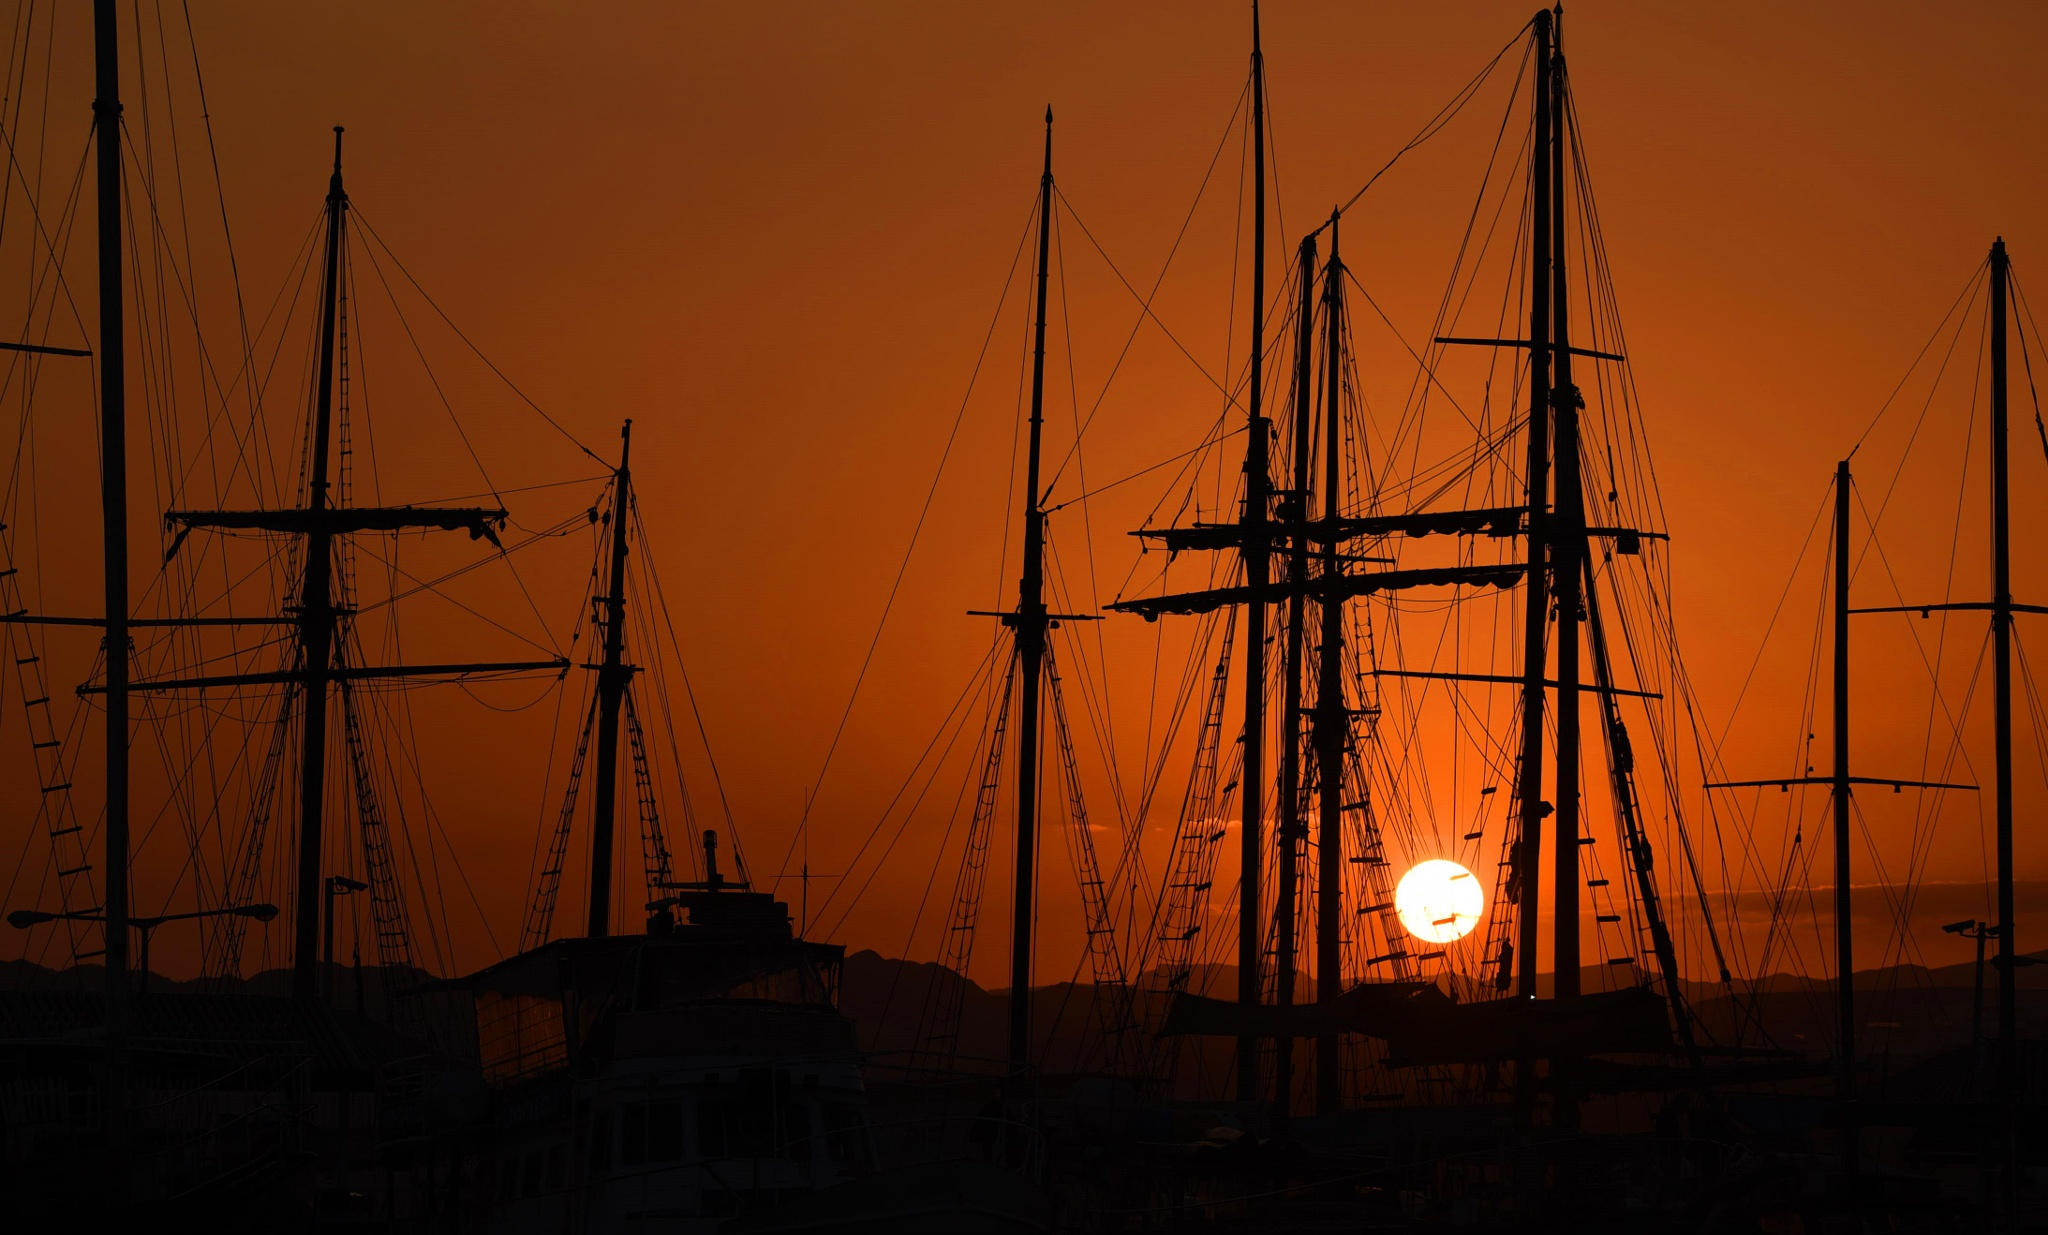 sunset in eilat by hananel hebe